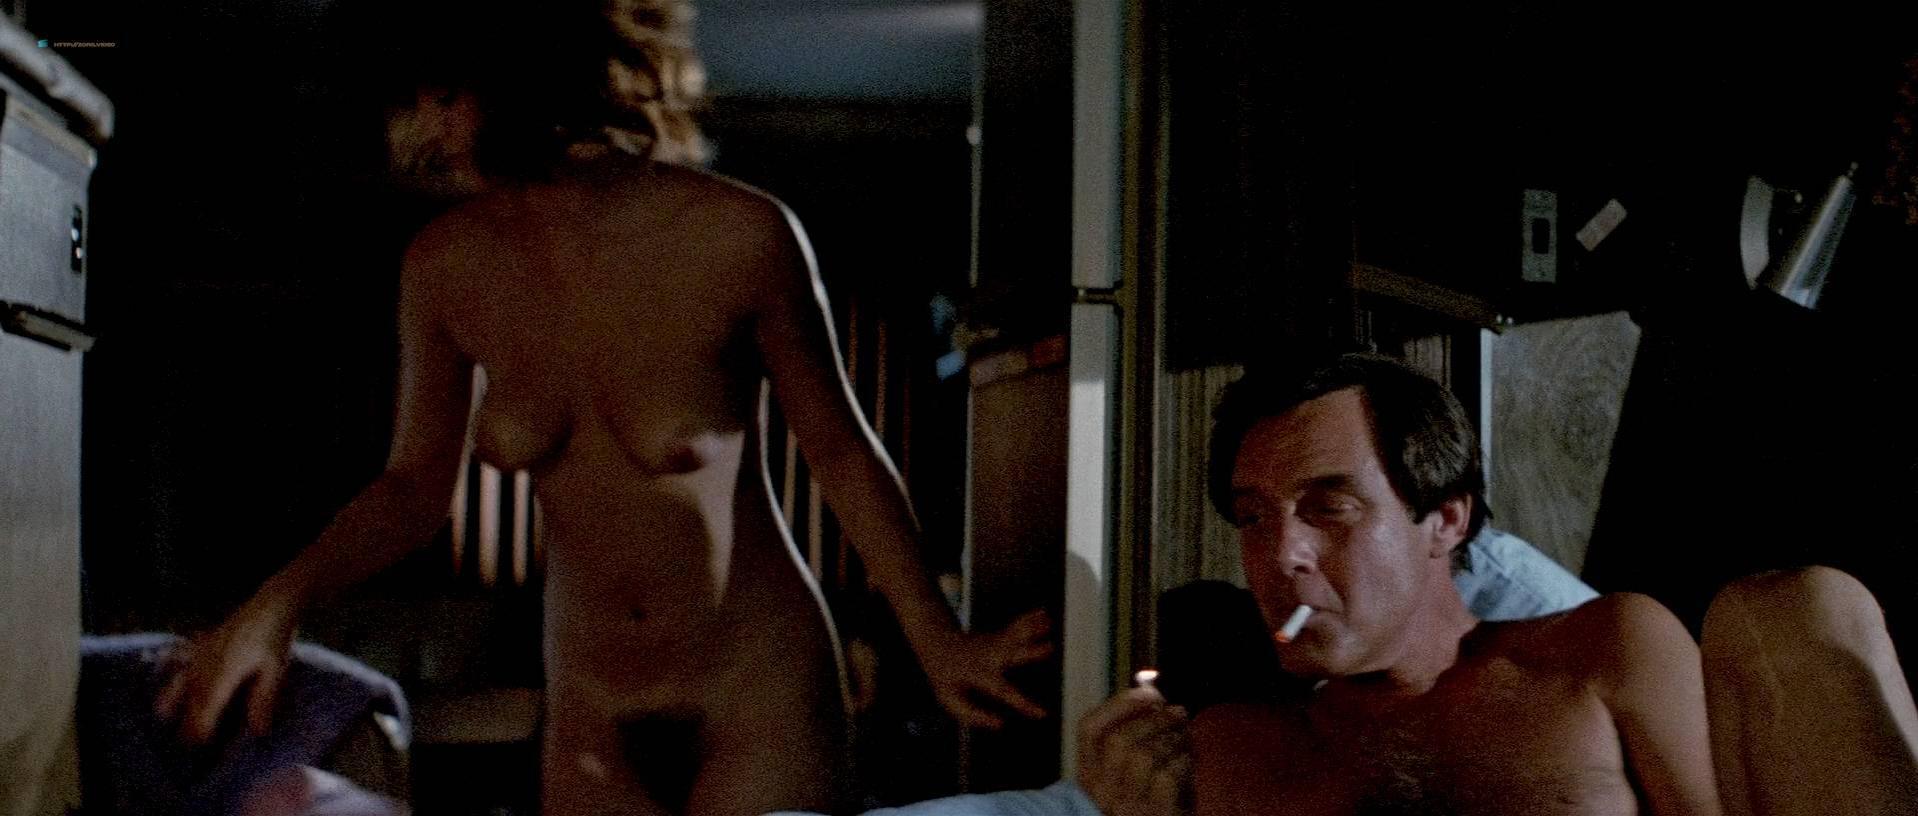 pettet pics Joanna nude